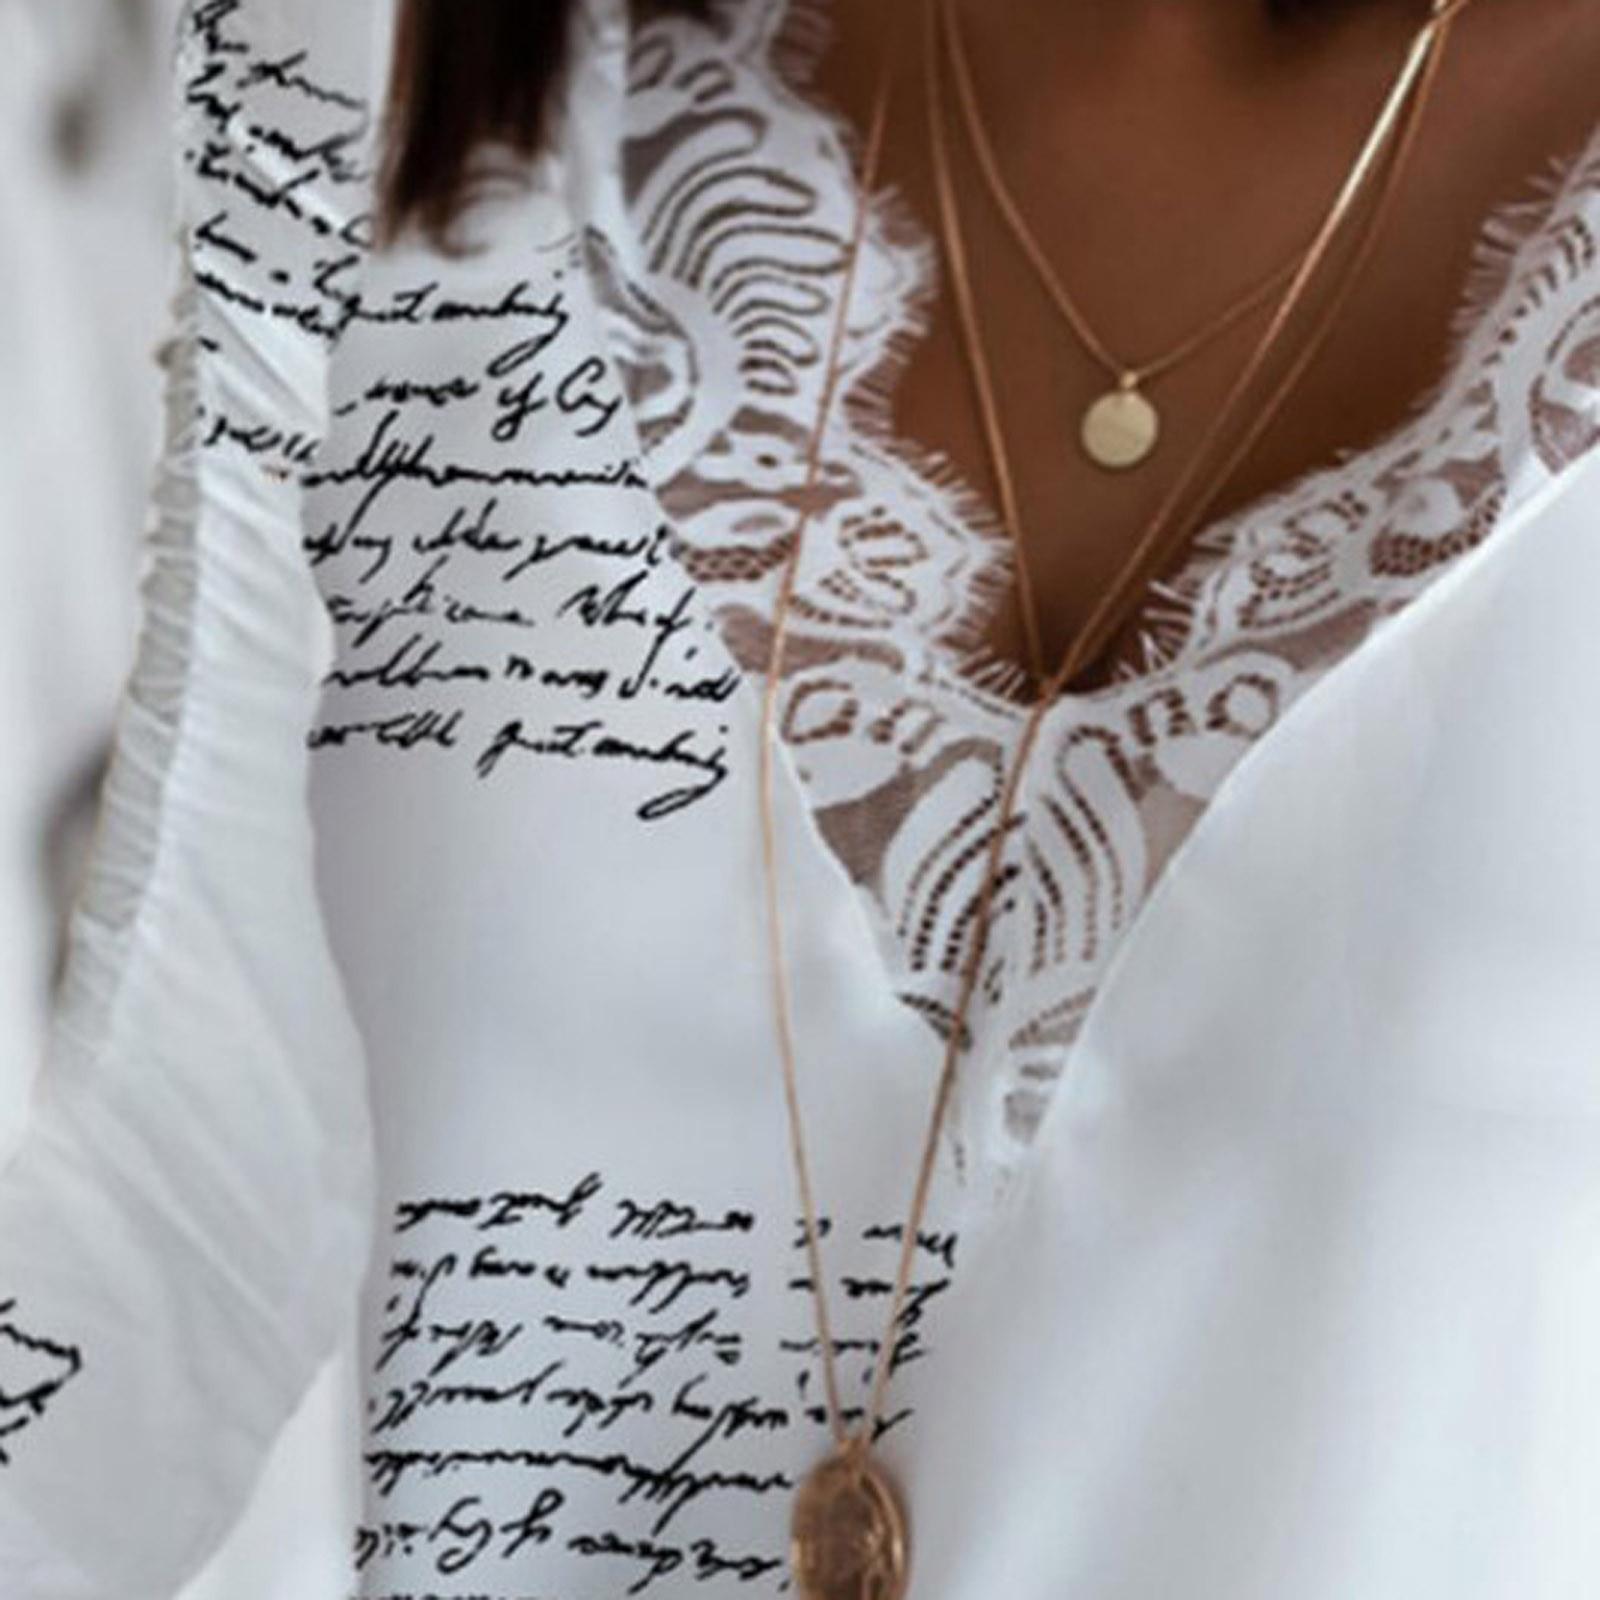 Women's Lace Print V-Neck T-Shirt Casual Long Sleeve Top Splicing Fashion Harajuku Streetwear Shirt Plus Size Women Clothes 2020